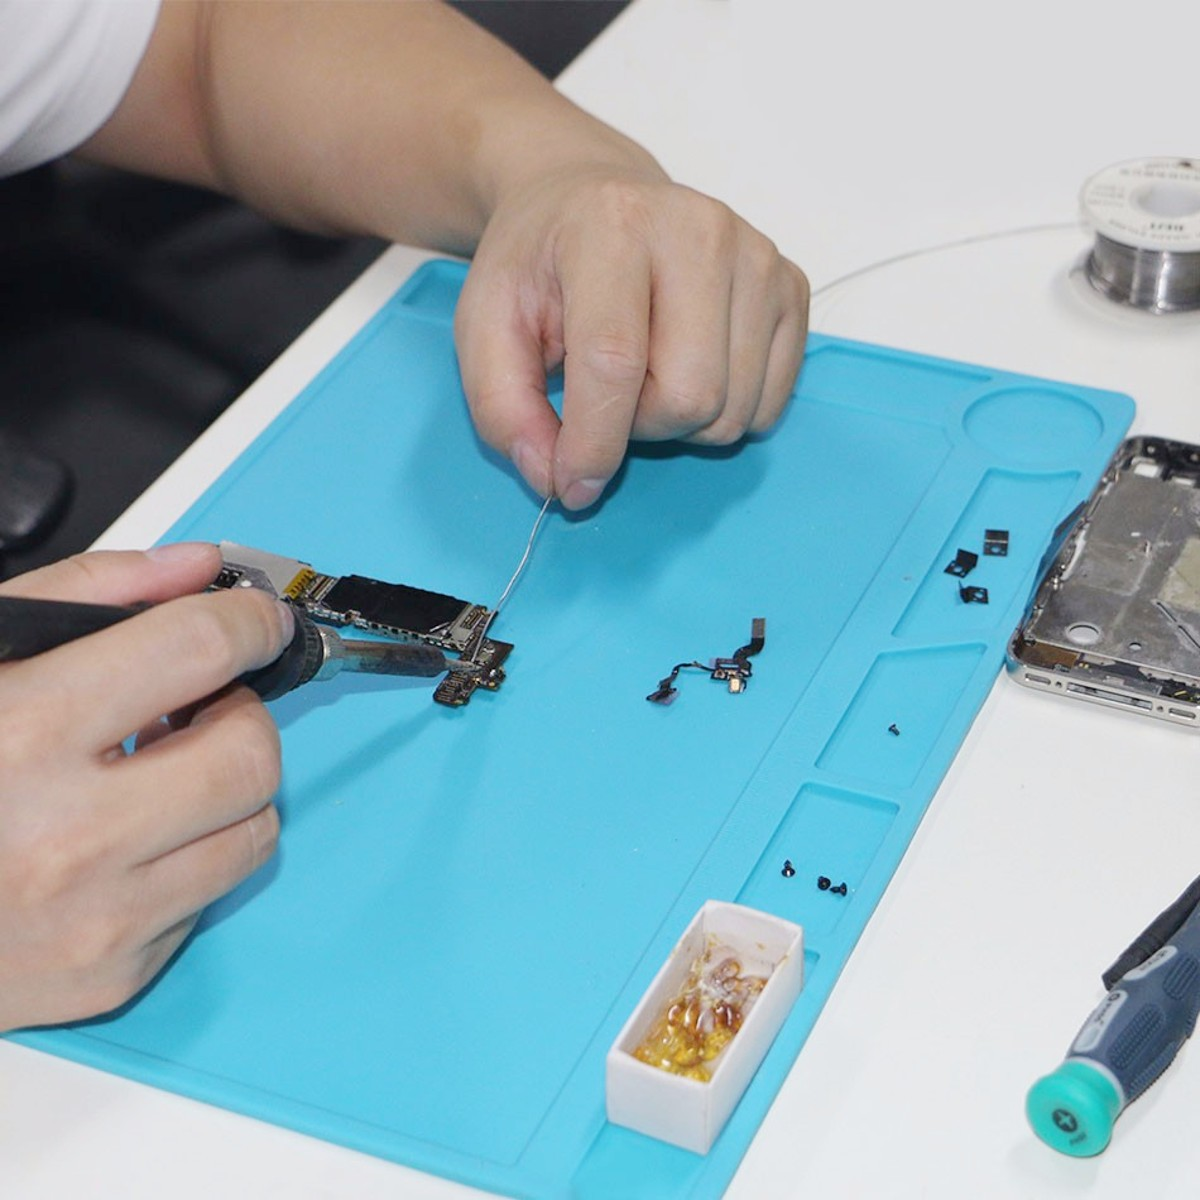 23x34cm Heat-resistant  Soldering Repair Insulation Pad Maintenance Platform  Heat Insulation Silicone Pad